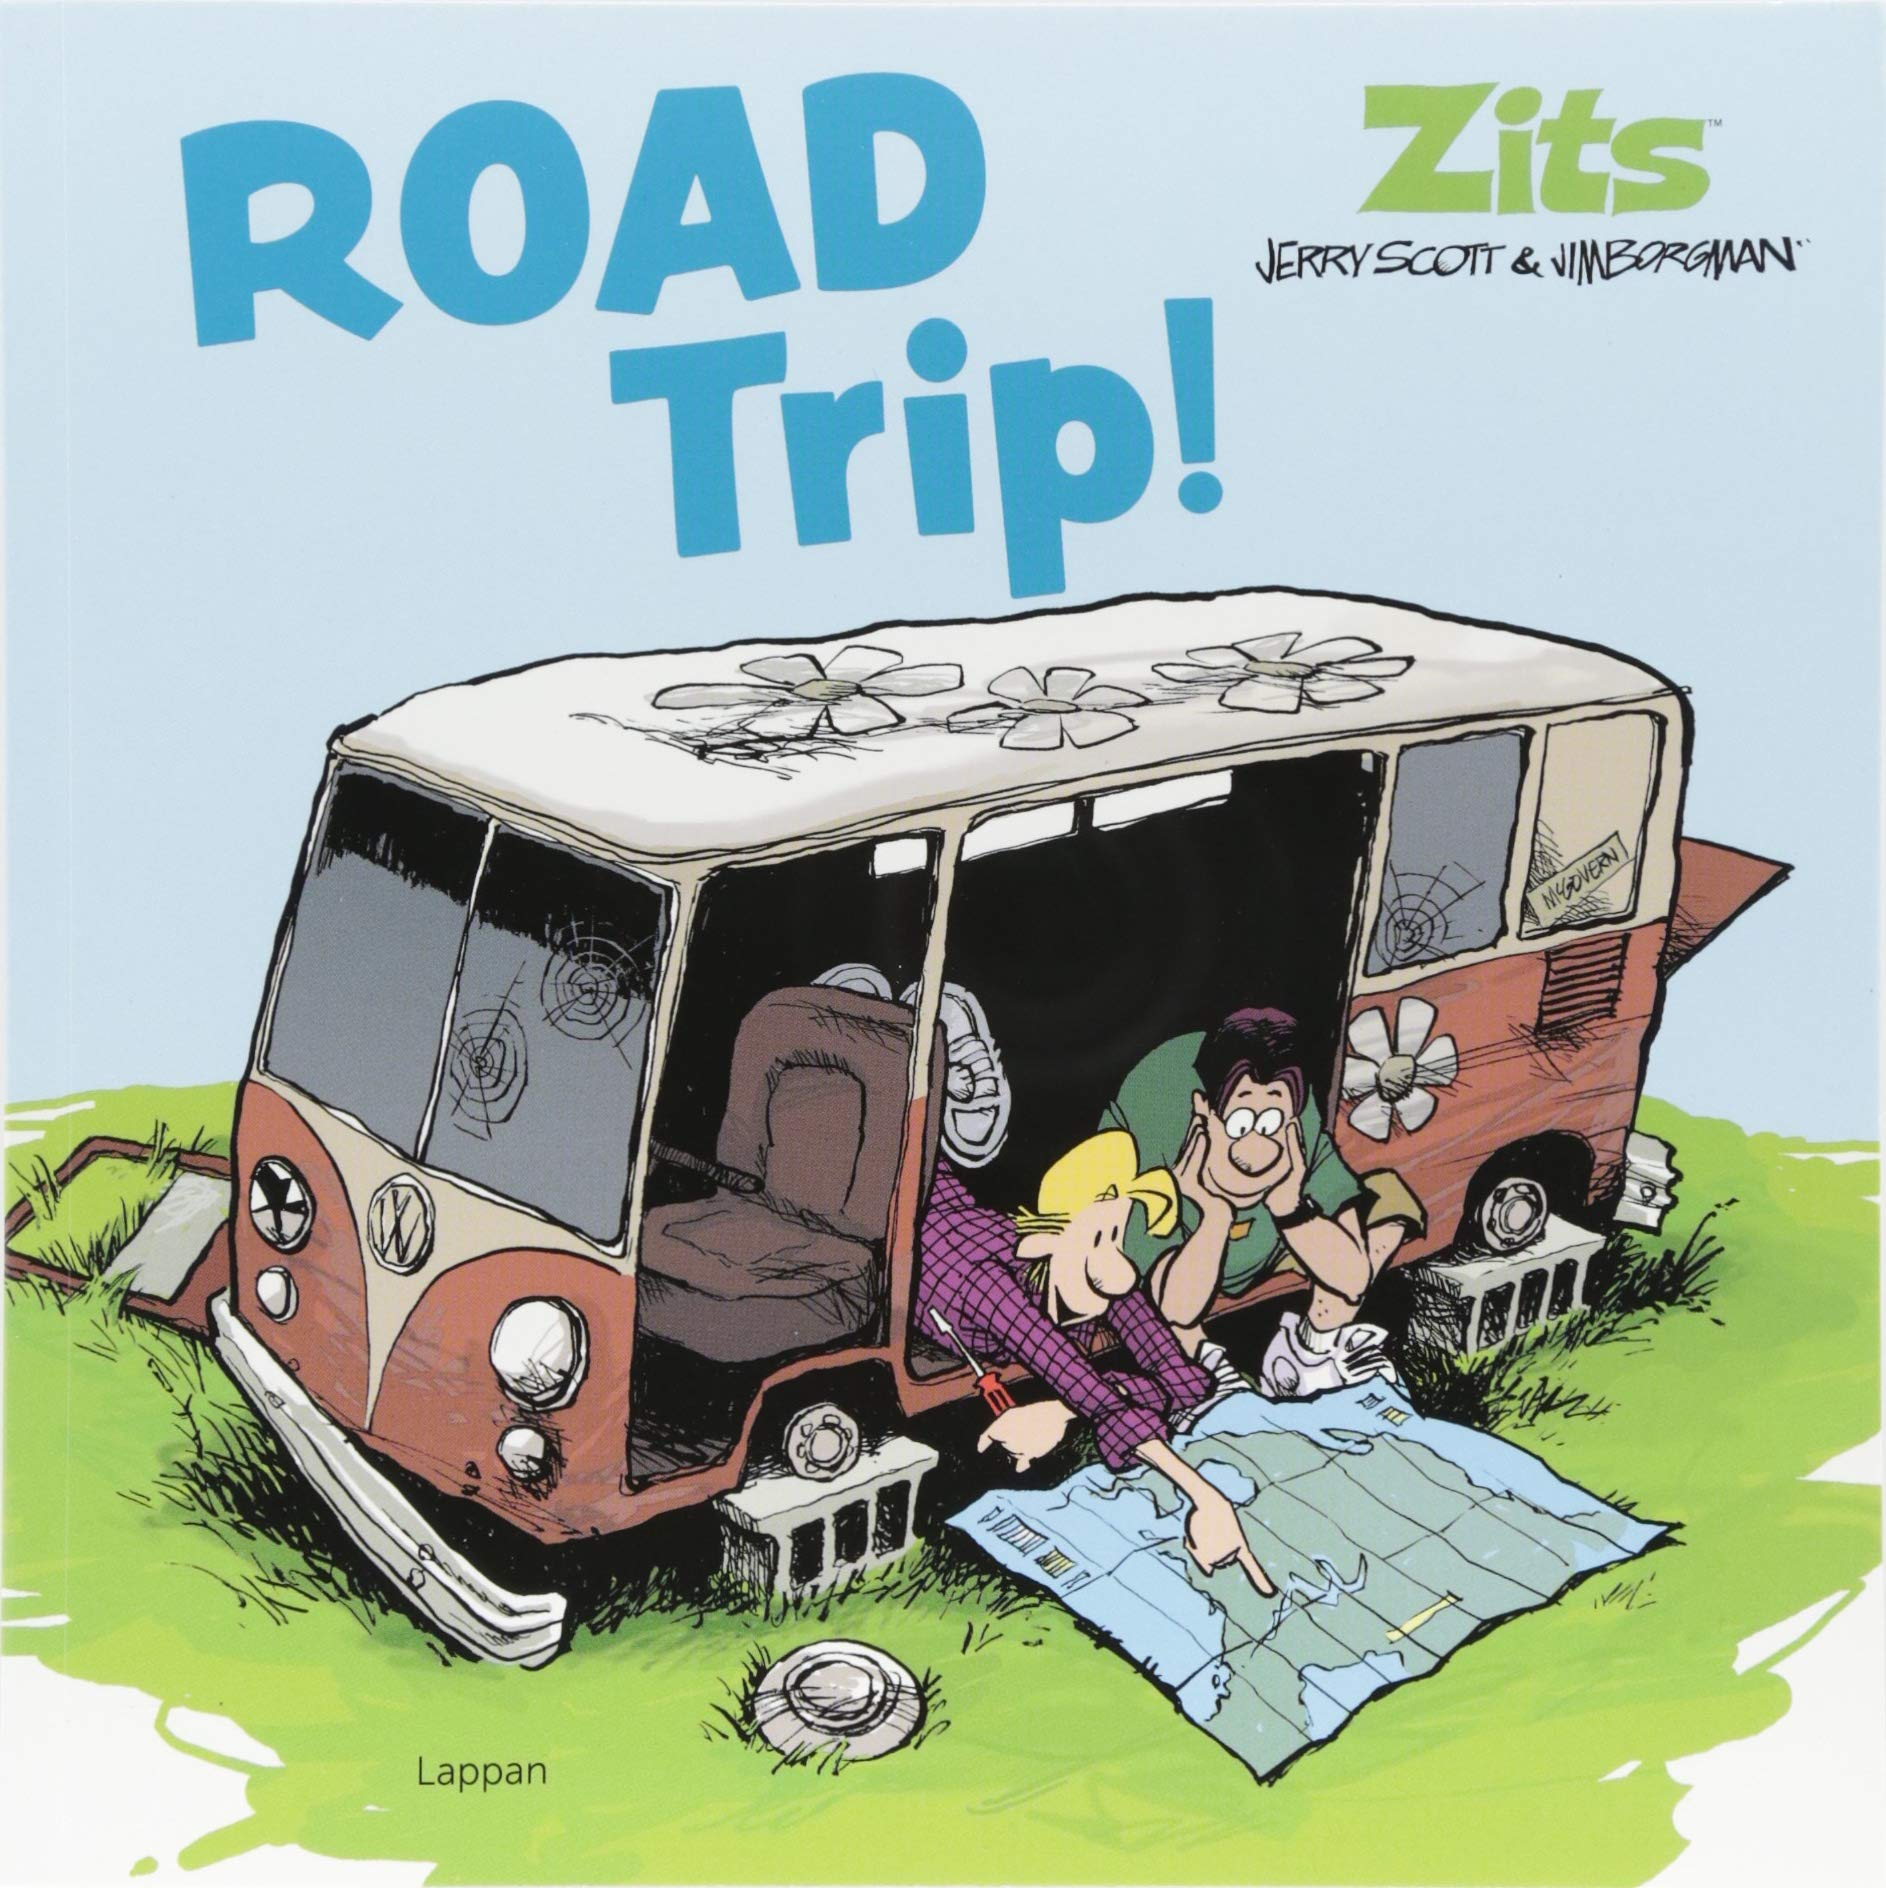 Zits: Road Trip!: Band 15 Taschenbuch – 28. Juni 2018 Jerry Scott Jim Borgman Lappan 3830380372